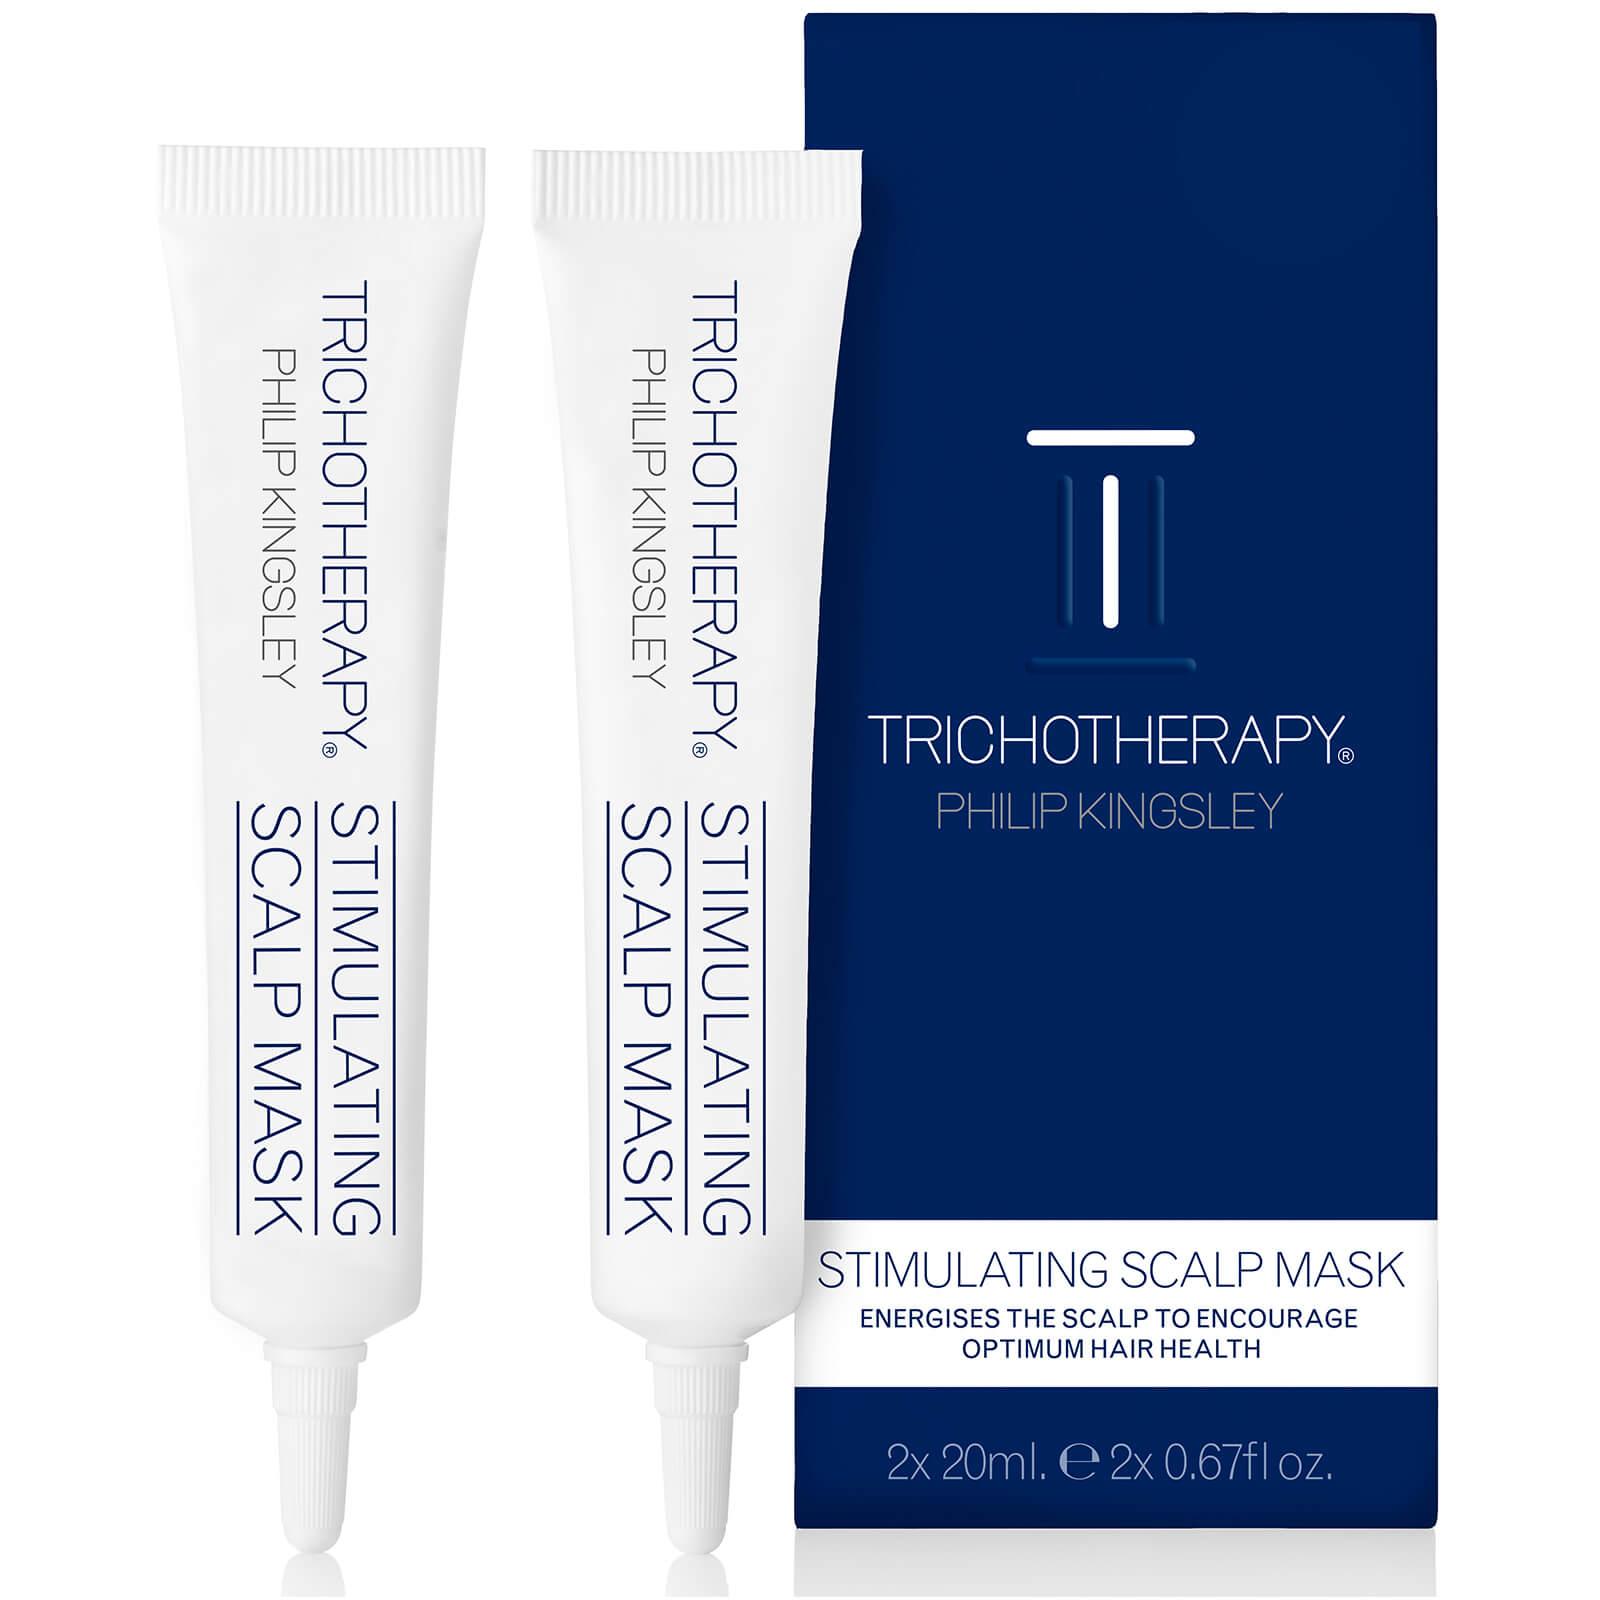 Philip Kingsley Trichotherapy Stimulating Scalp Mask 2 x 20ml